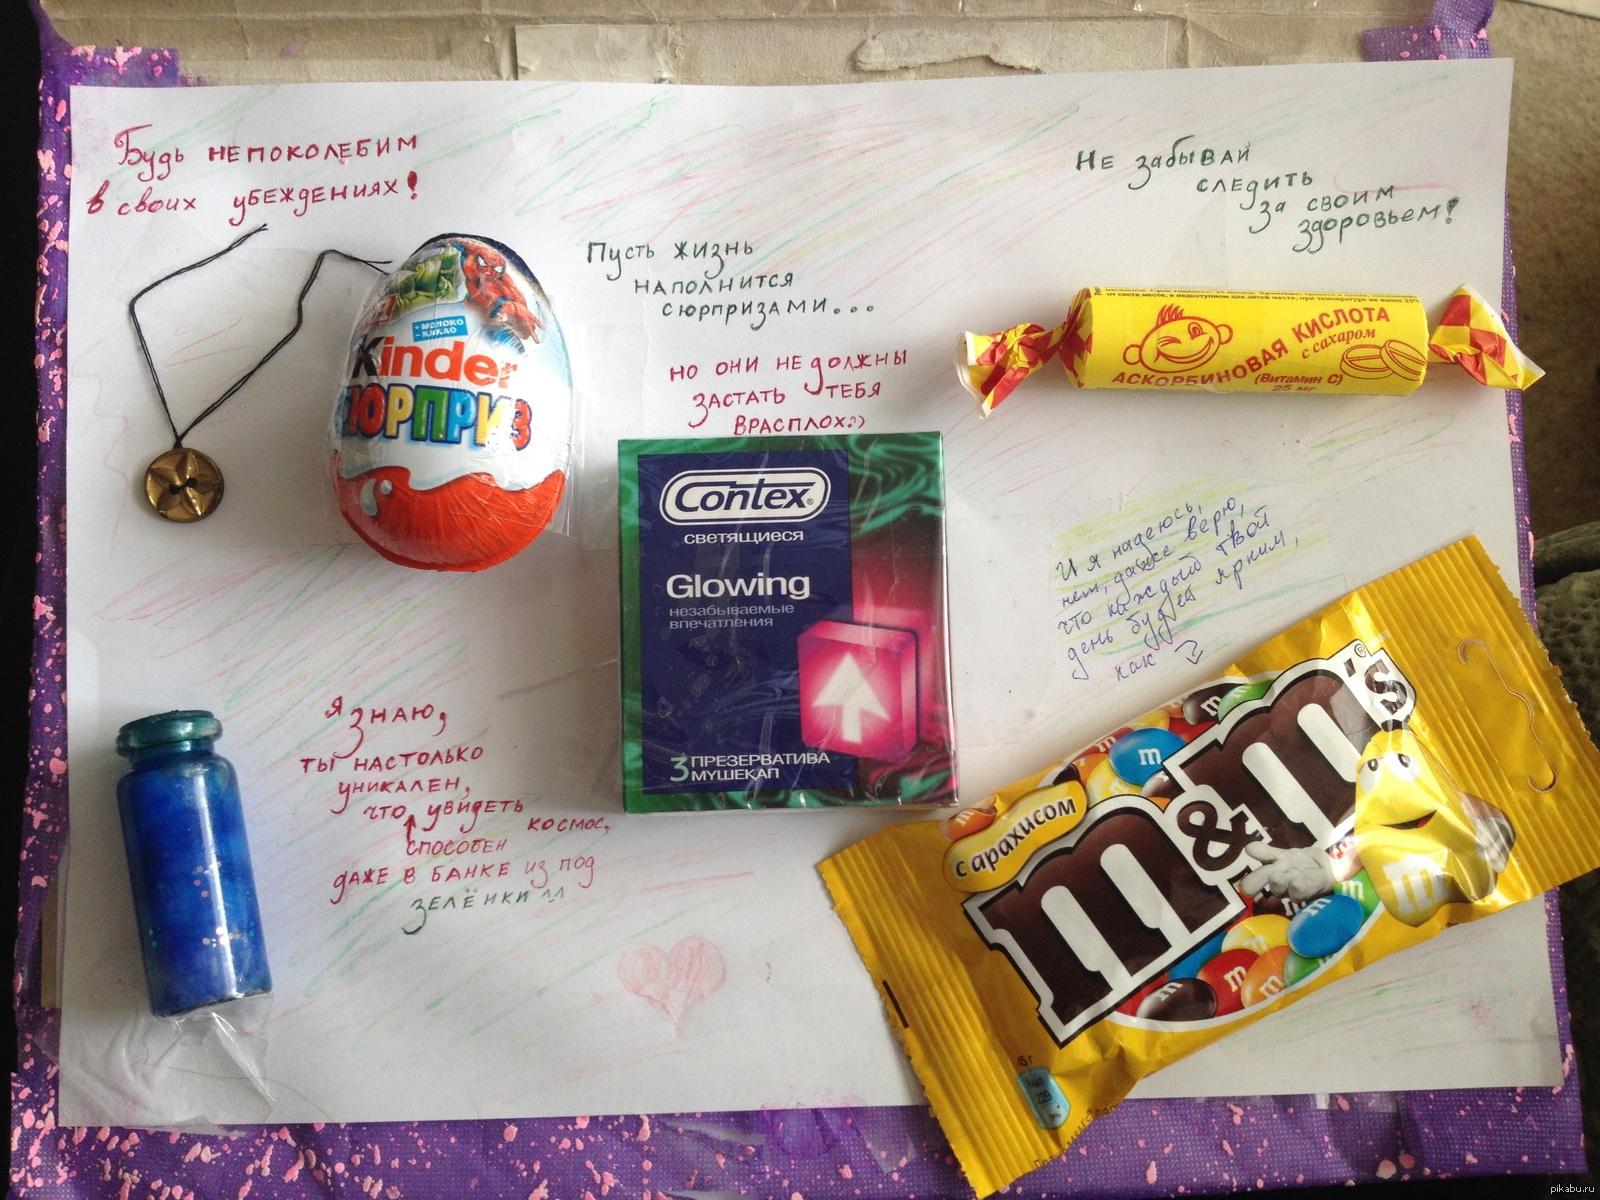 Подарки на 18 лет девушке от подруги